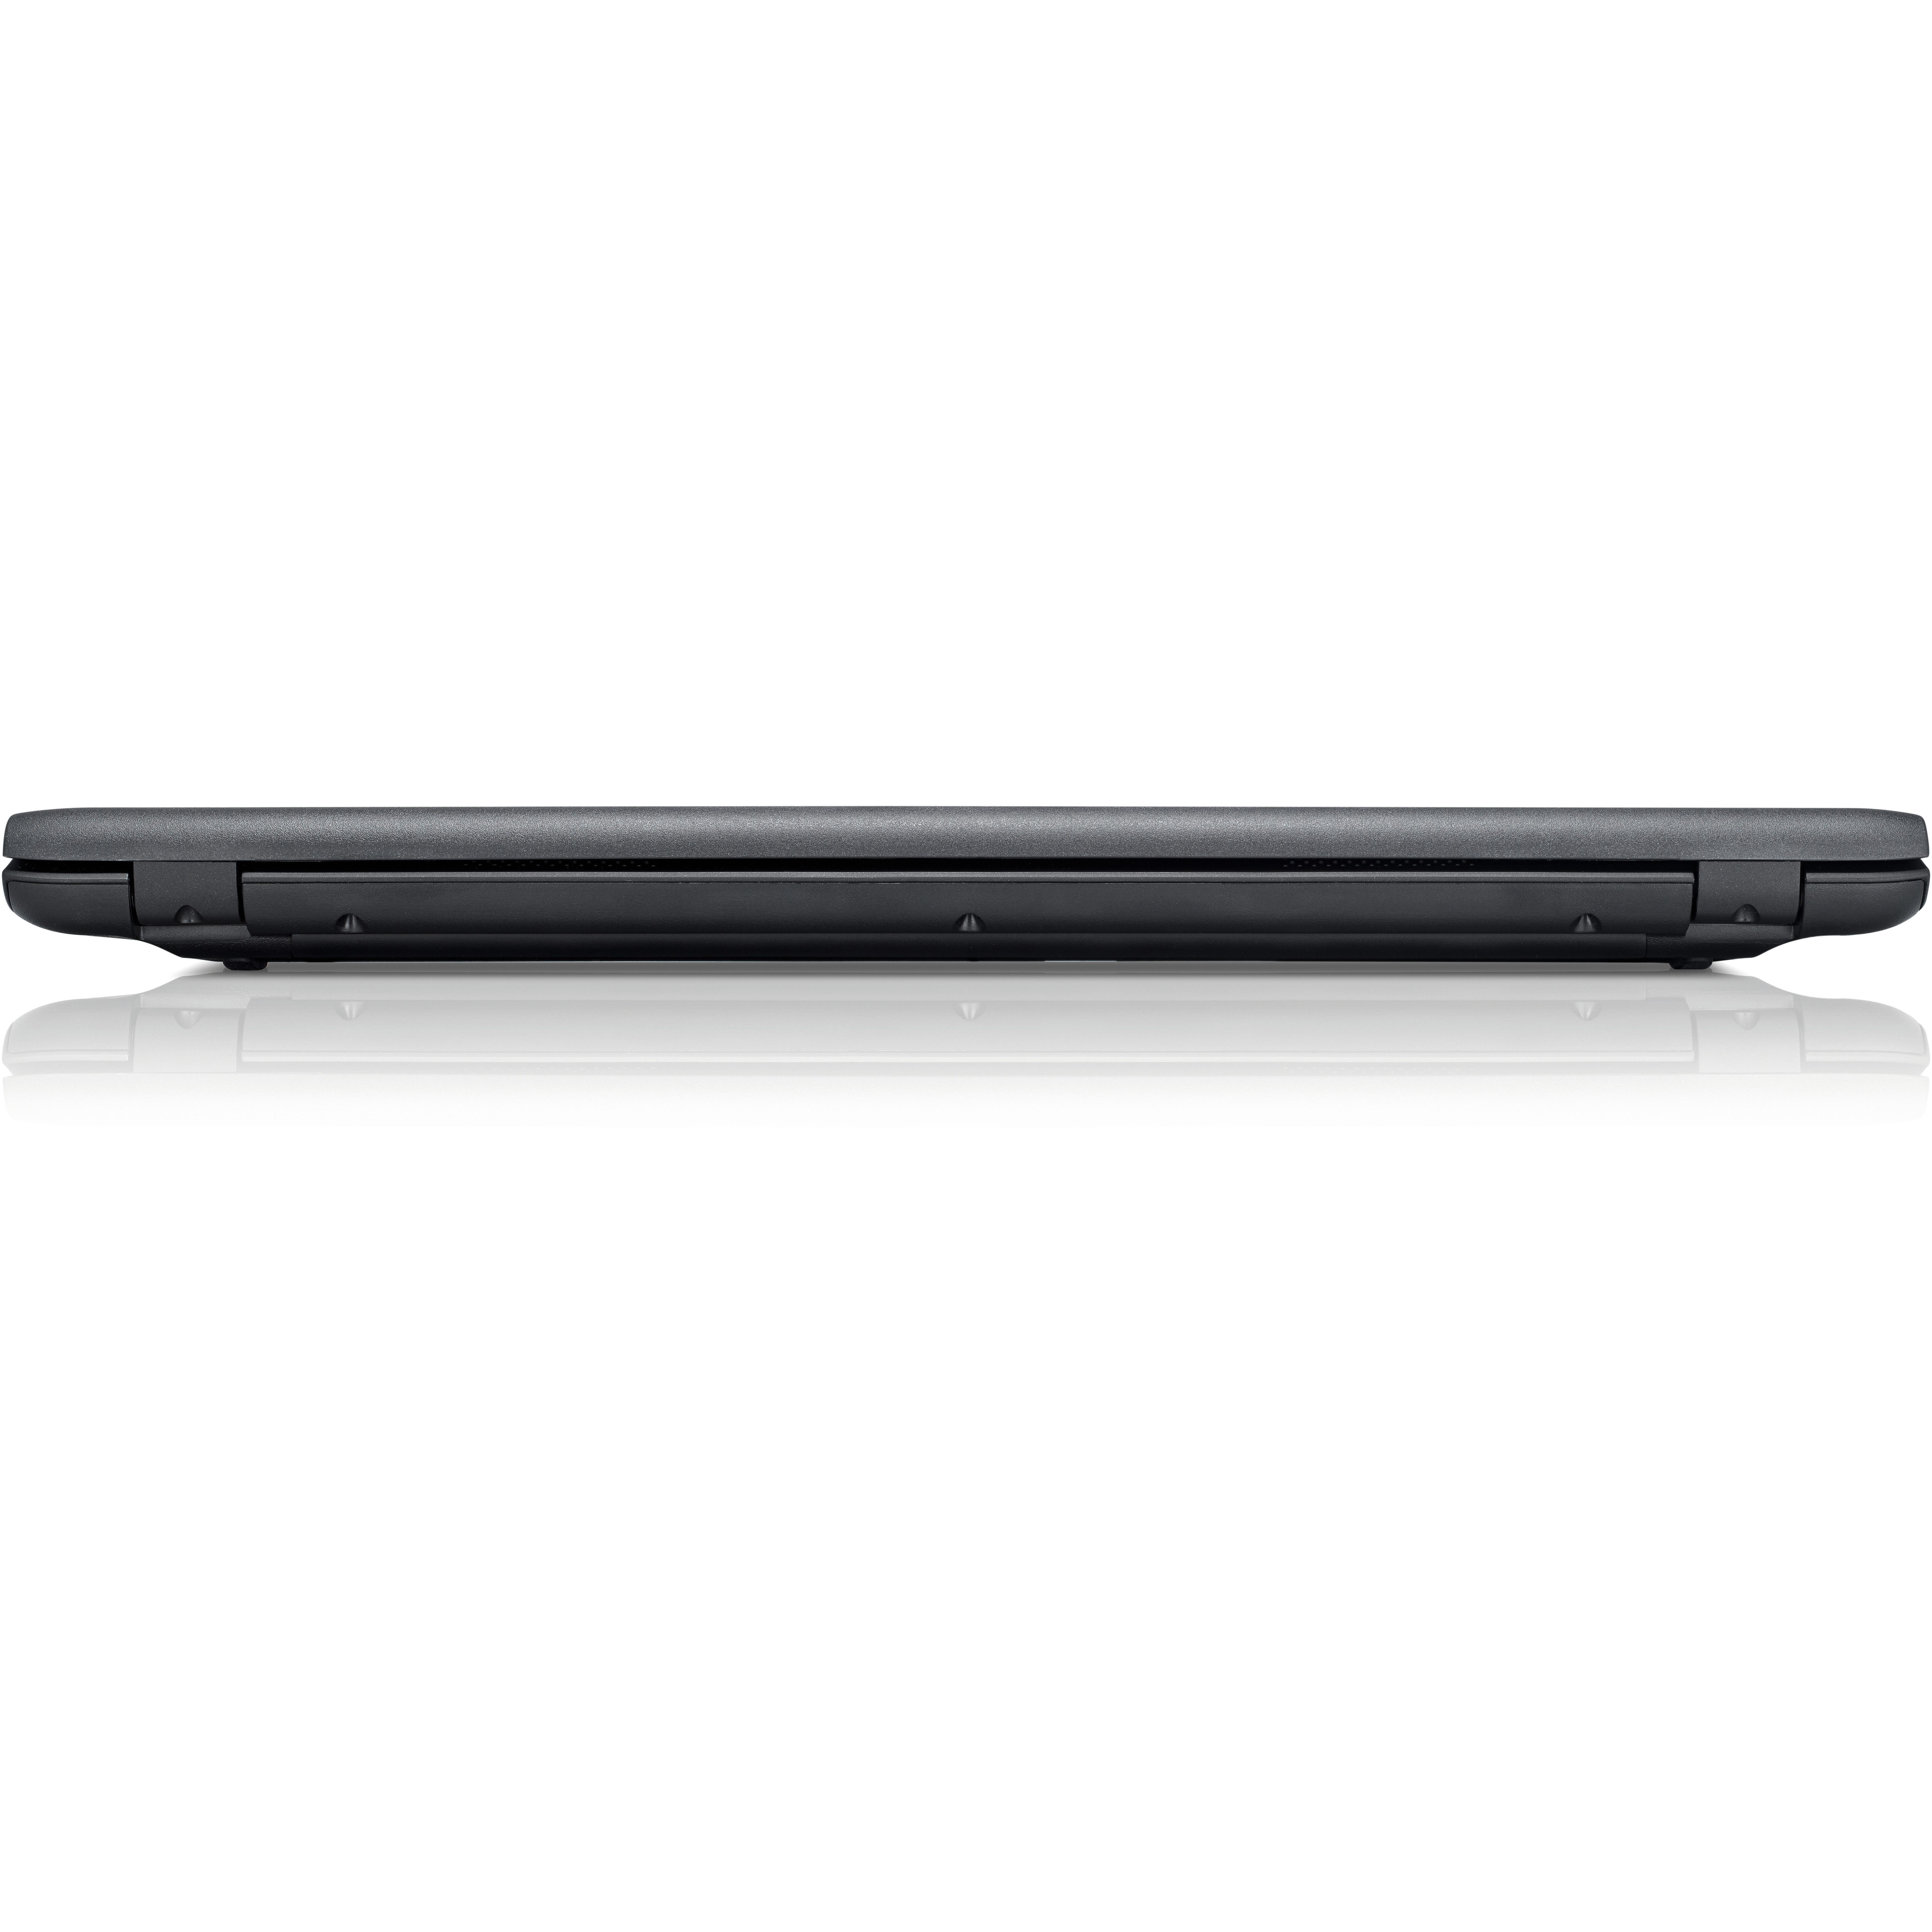 Fujitsu LIFEBOOK A557 39.6 cm 15.6inch LCD Notebook - Intel Core i5 7th Gen i5-7200U Dual-core 2 Core 2.50 GHz - 8 GB DDR4 SDRAM - 256 GB SSD - Windows 10 Pro 64-